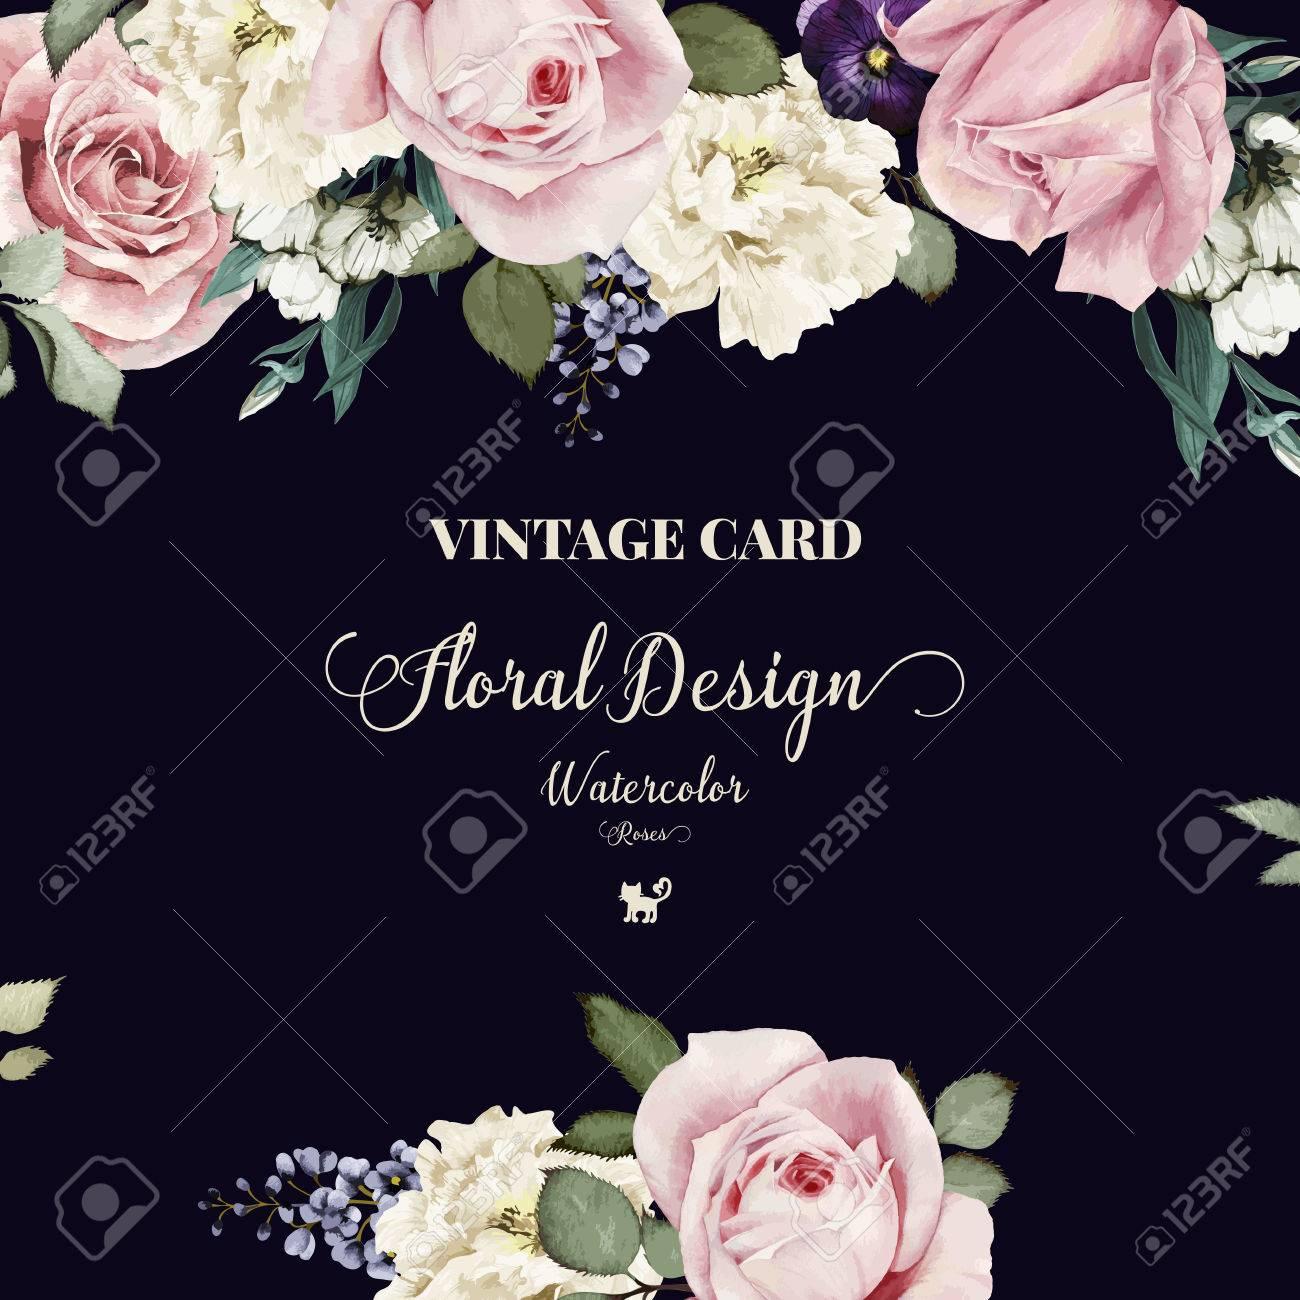 Cartoline Auguri Matrimonio : Vettoriale cartolina d auguri con le rose acquerello può